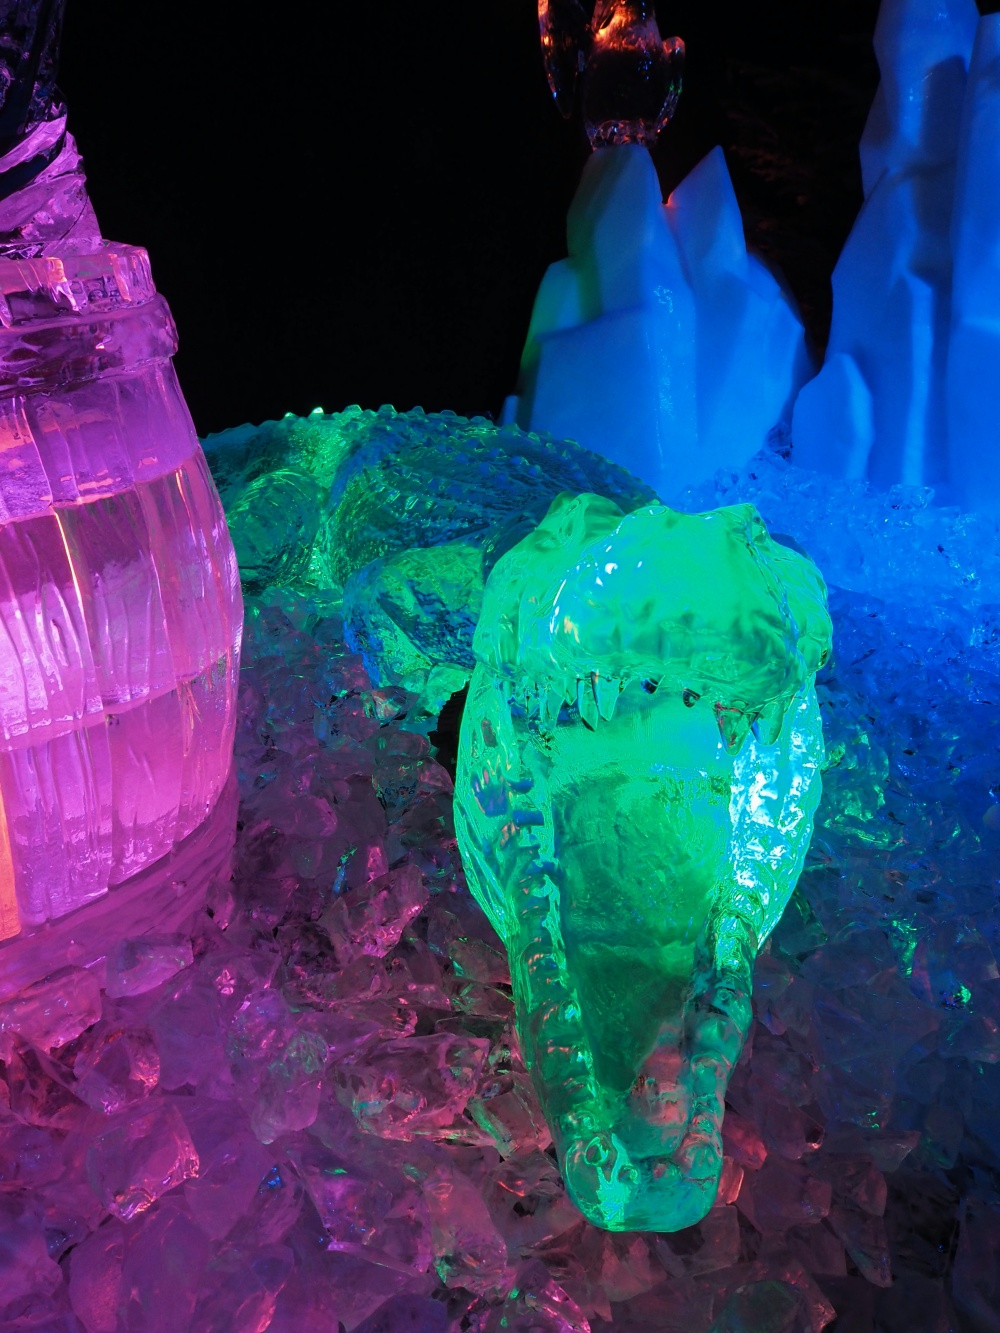 Eisskulpturen Winterzauber